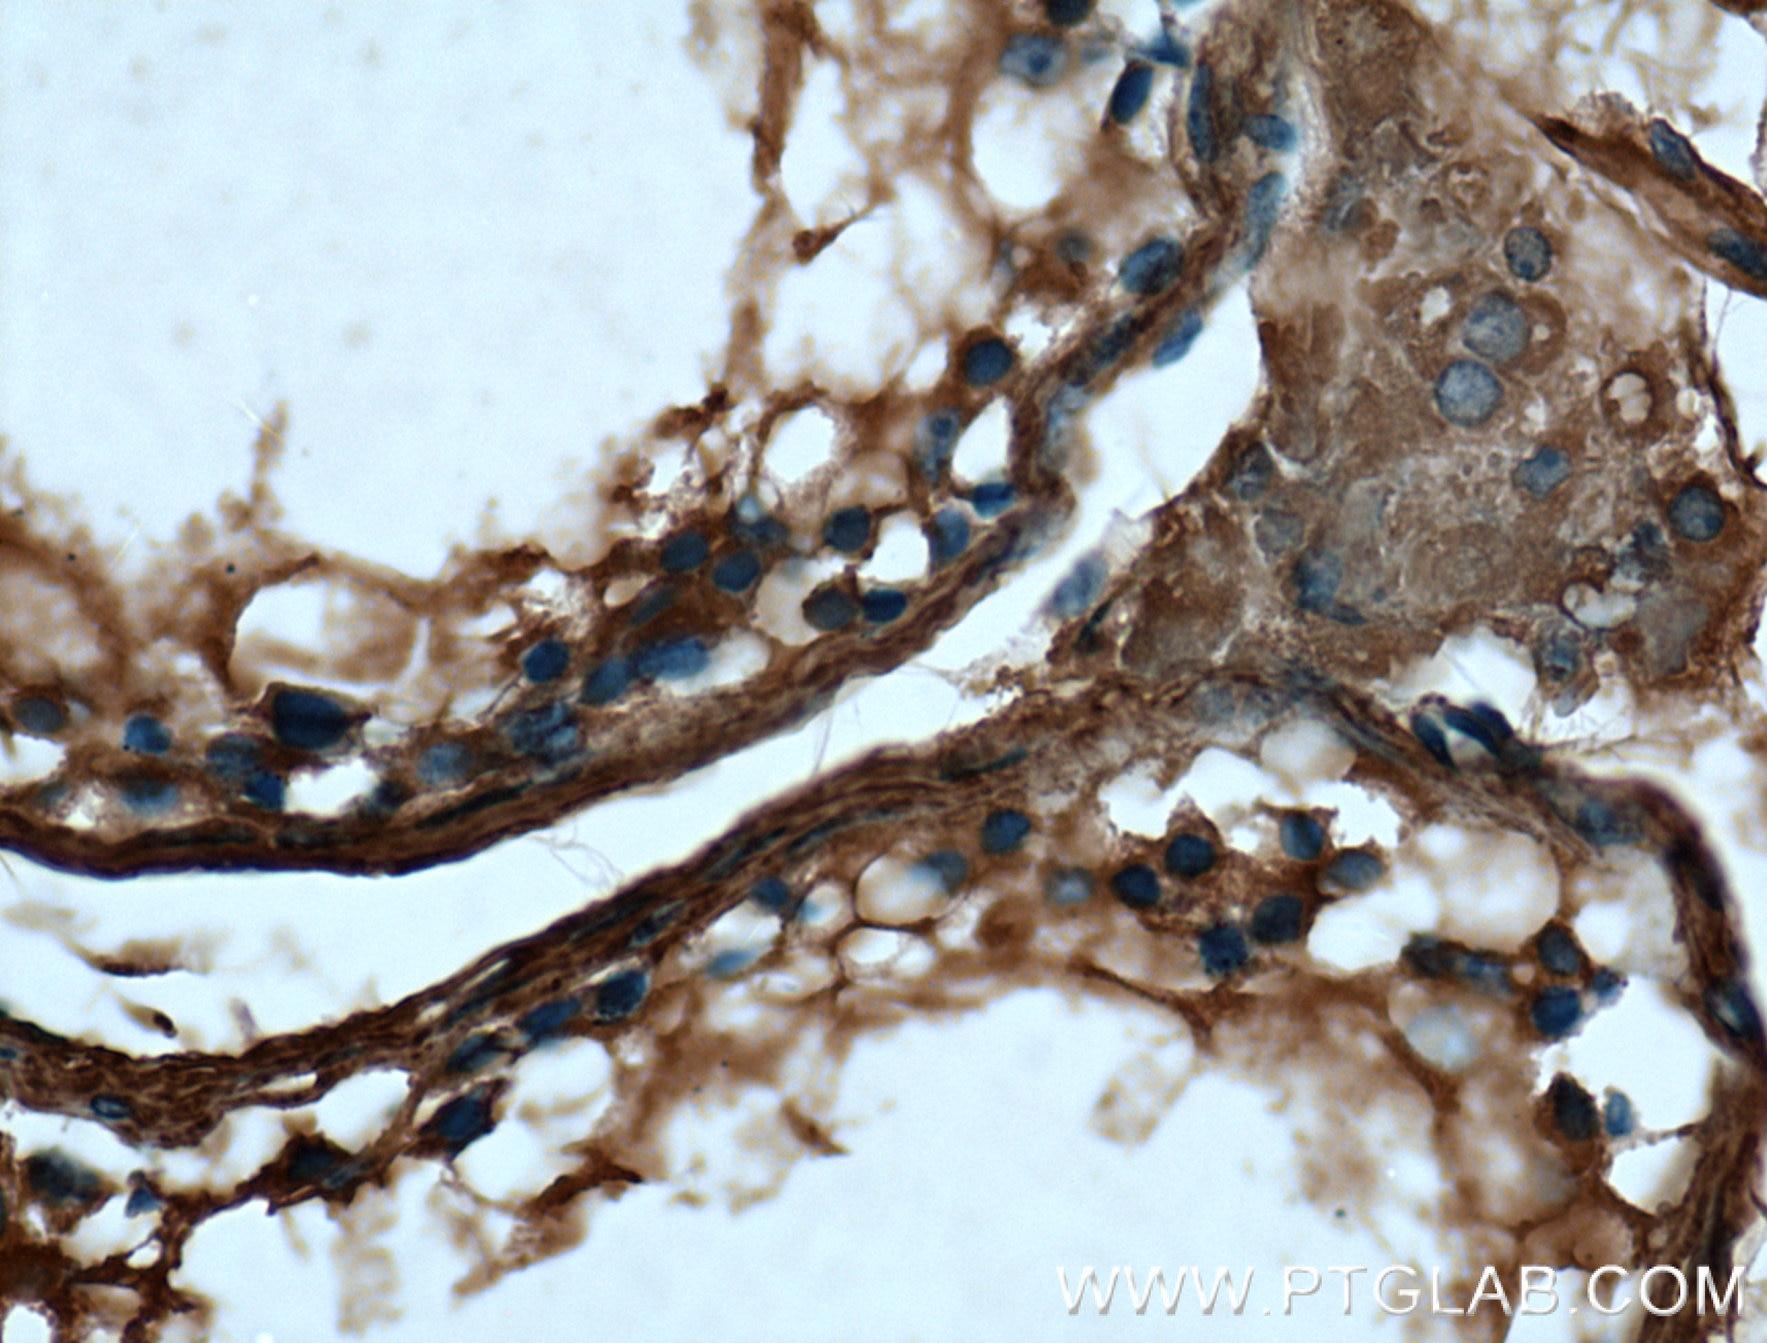 IHC staining of human testis using 66398-1-Ig